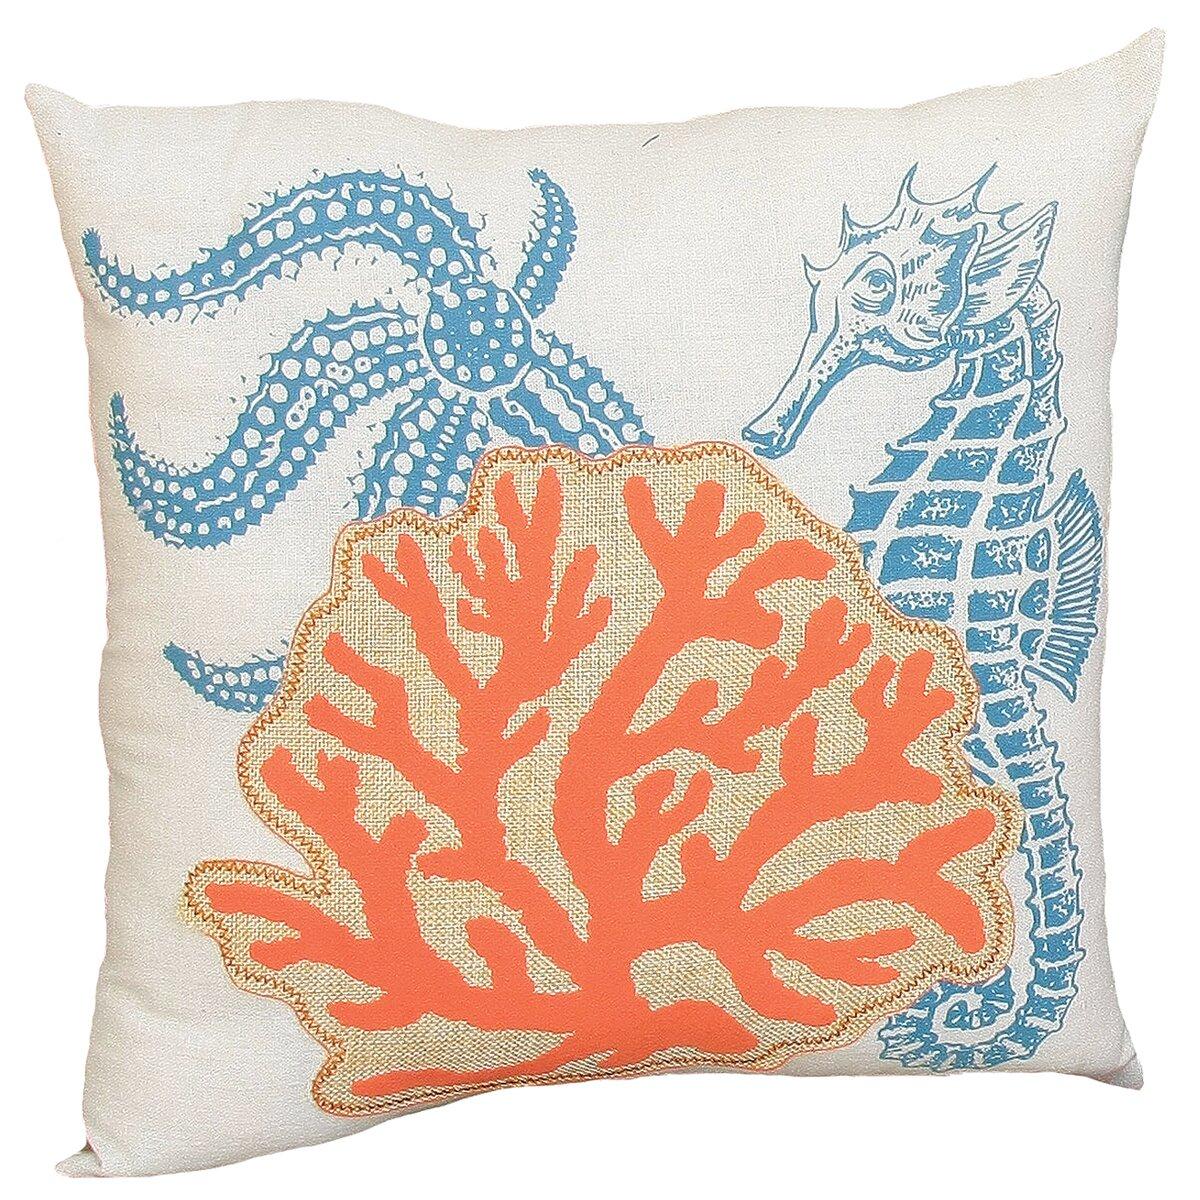 Sea Coral Throw Pillows : Xia Home Fashions Coastal Applique Sea Life and Coral Decorative Throw Pillow & Reviews Wayfair